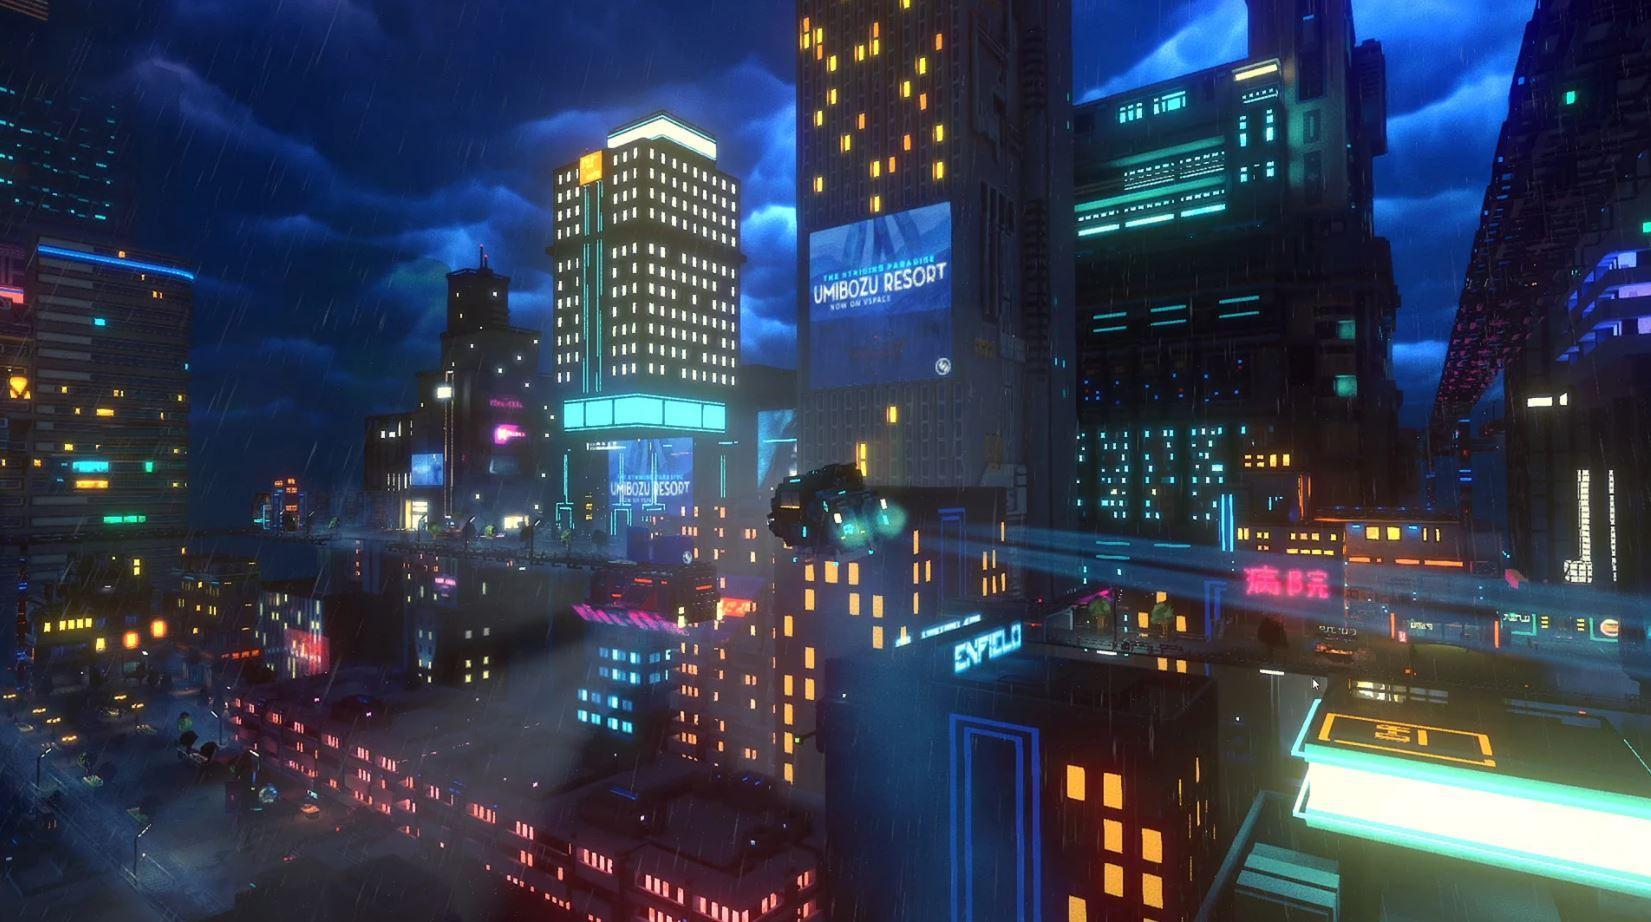 cloudpunk-ps4-review-2